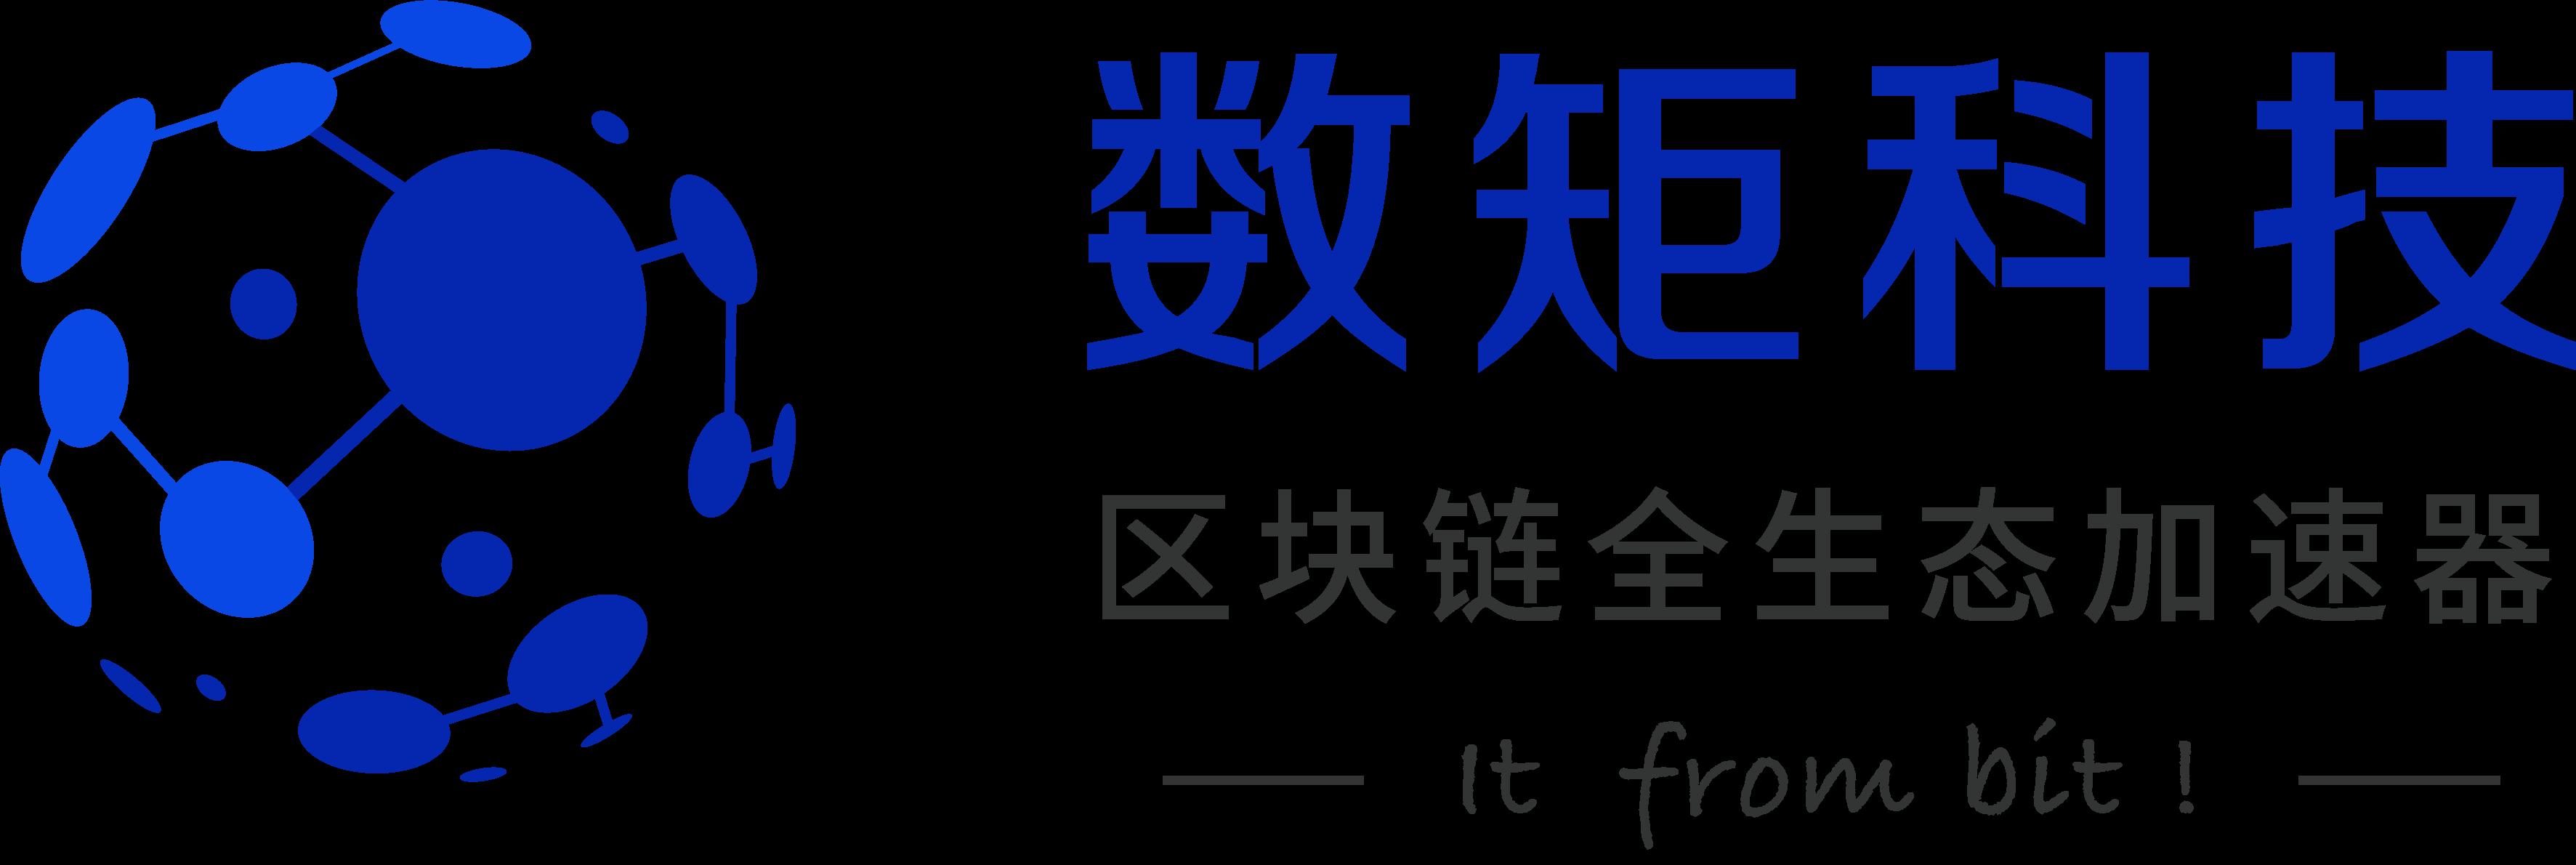 Shuju Tech